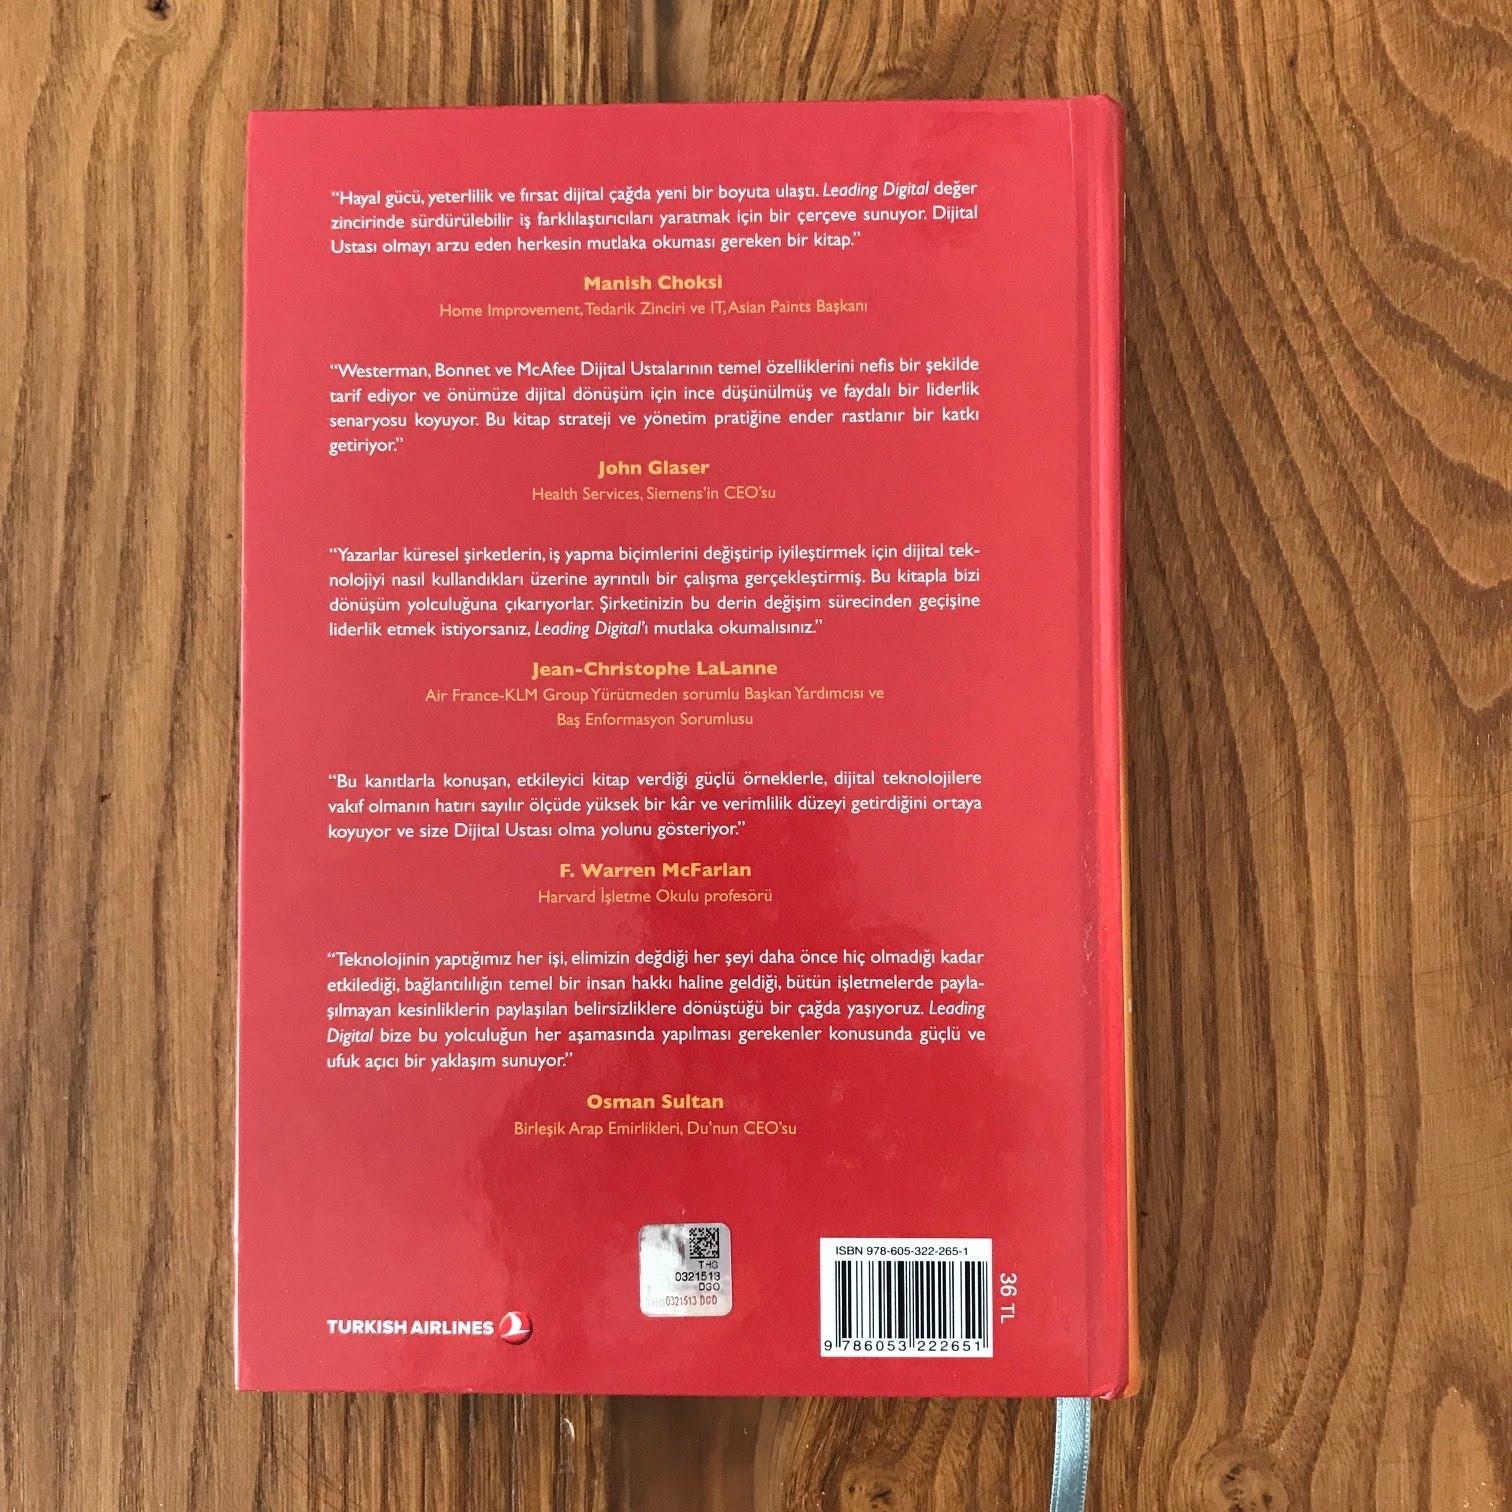 Leading Digital - Donusum Icin Teknolojiyi Kullanmak (Kitap)